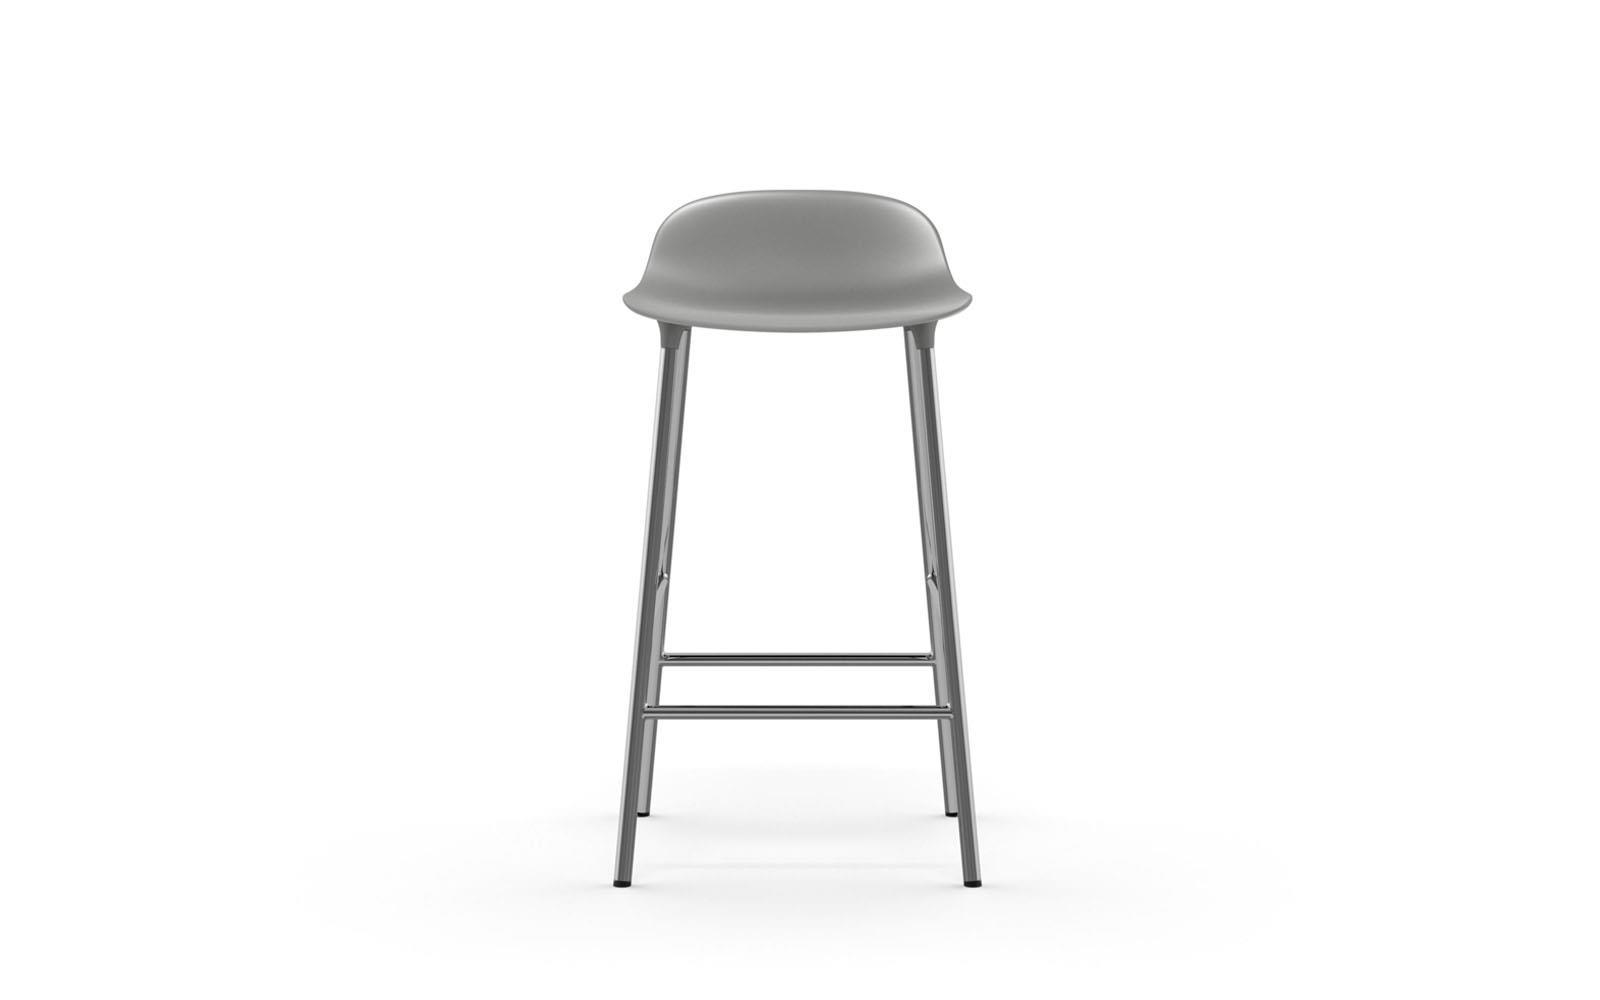 2dd5eb55c Form barstol 65 cm grå/krom